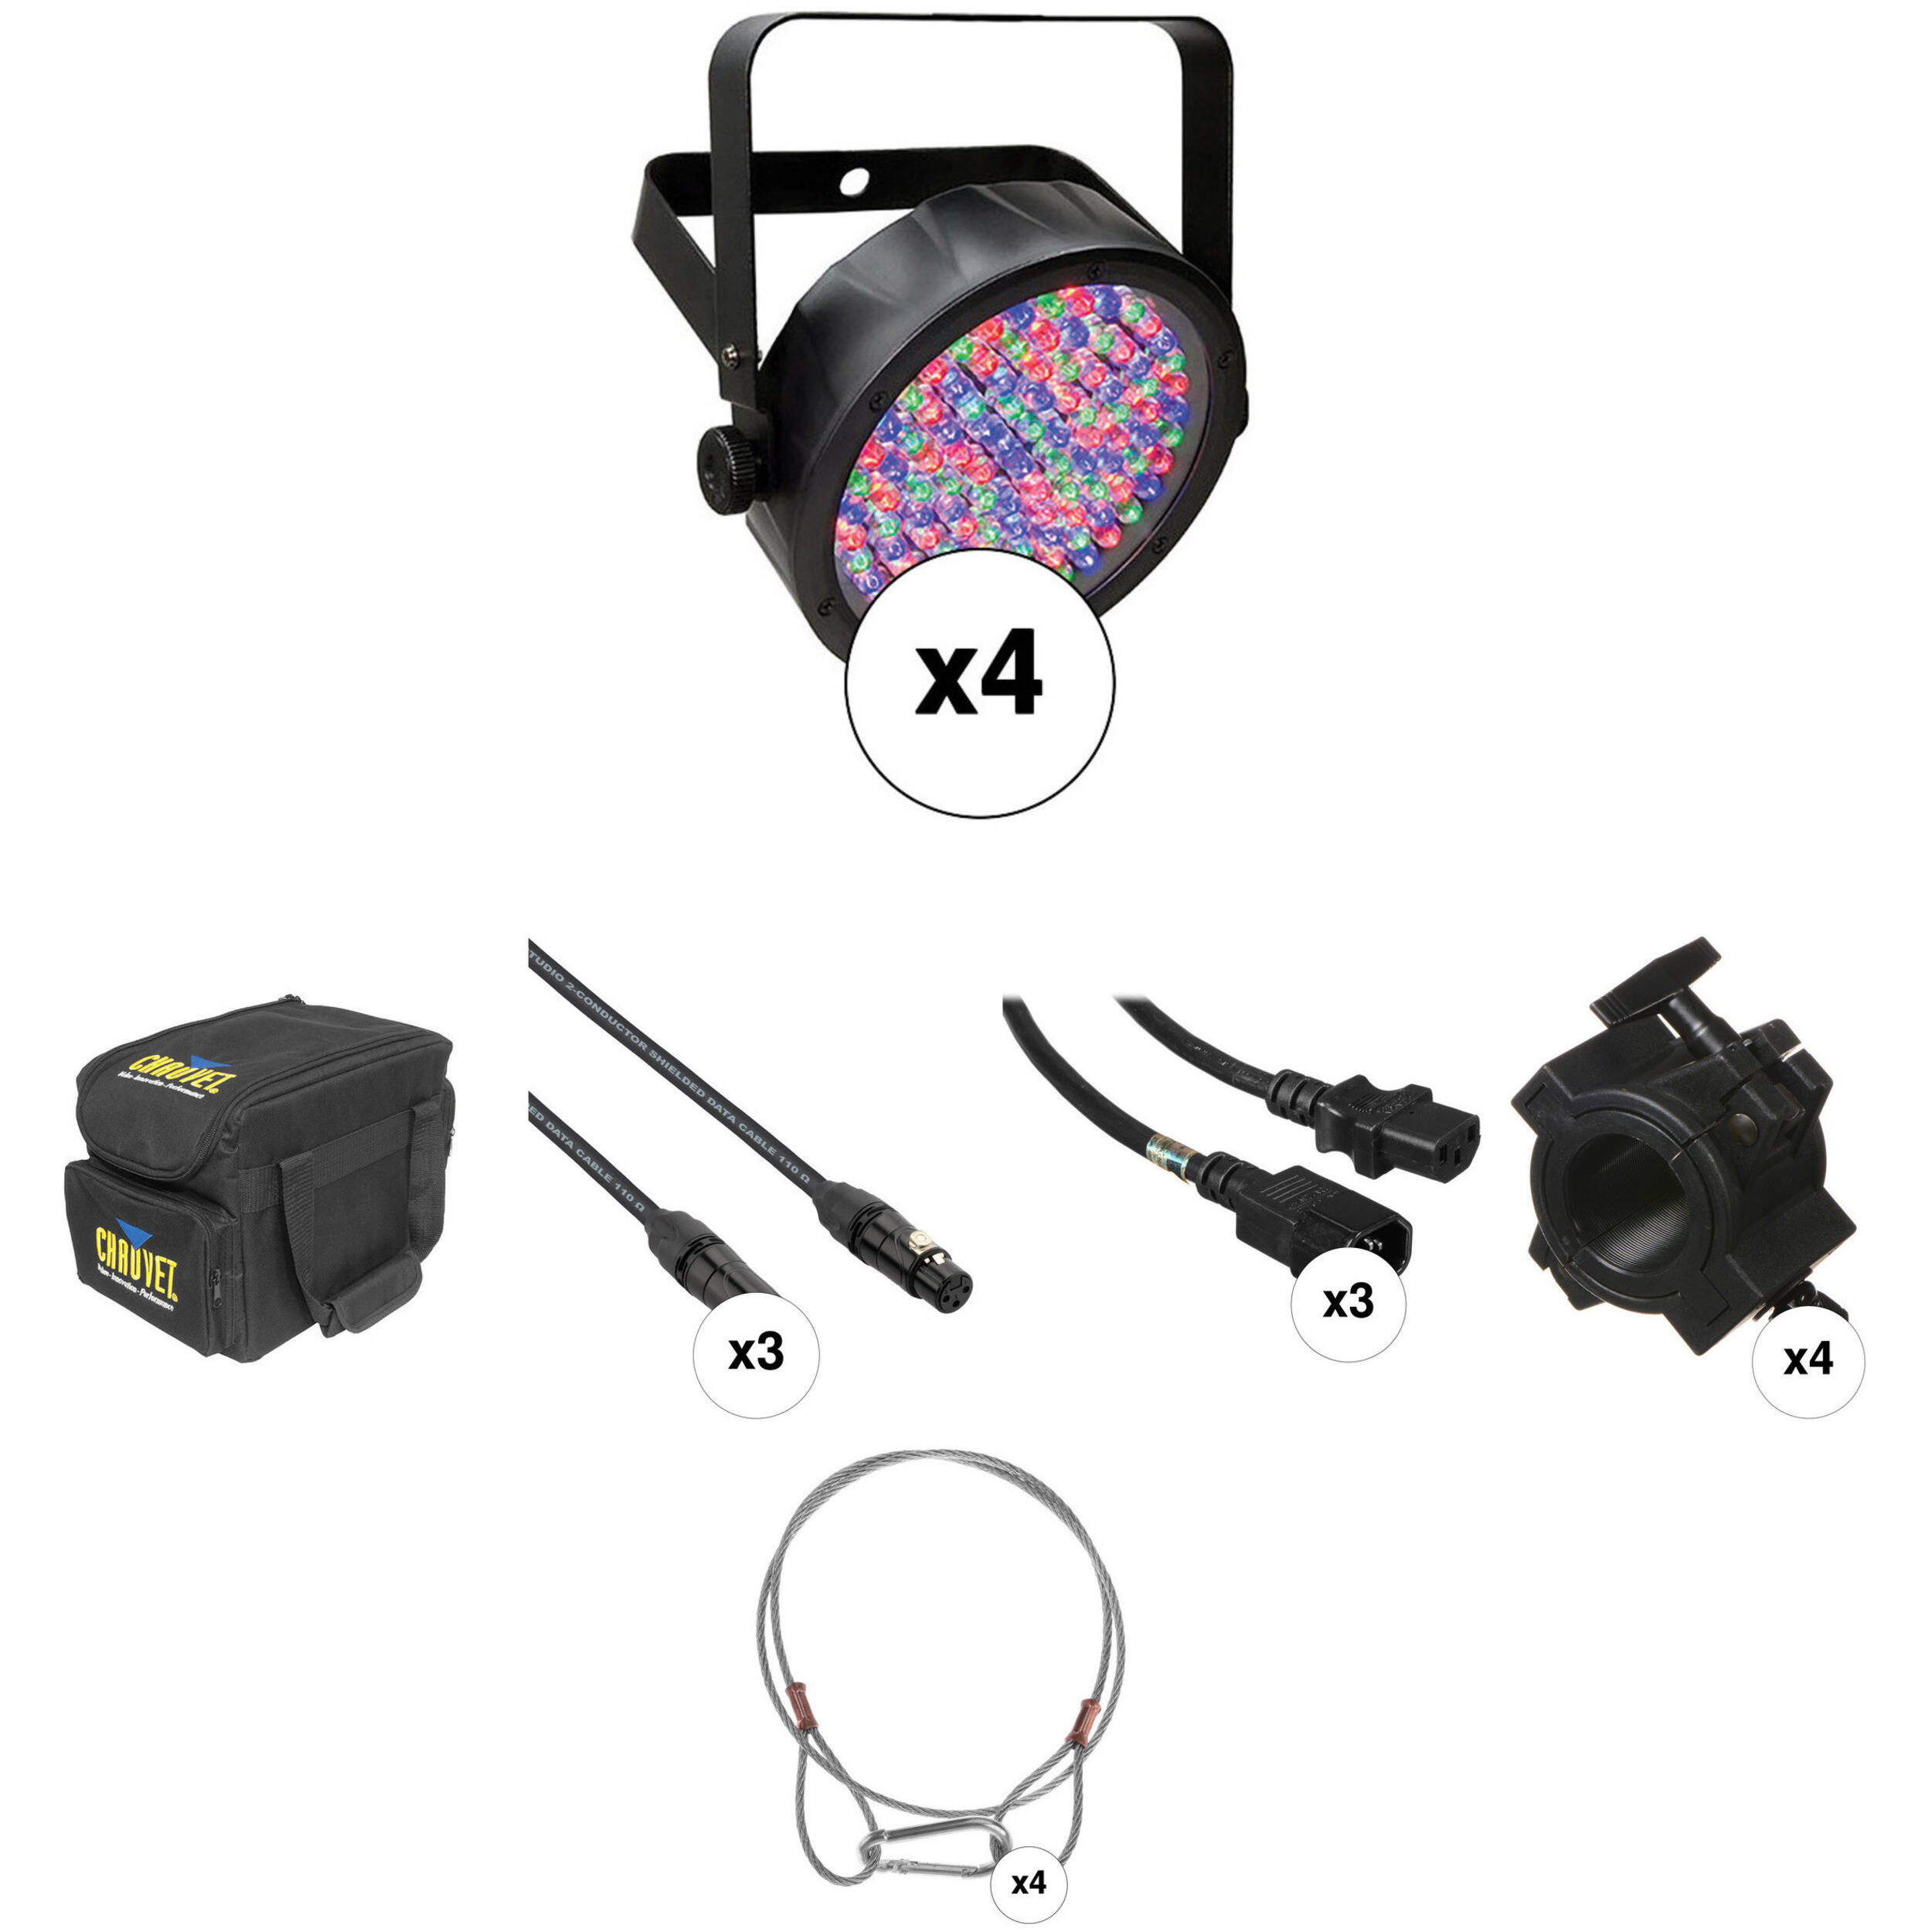 Https C Product 1183023 Reg Baja Designs Led Hid Universal Wiring Harness Splitter 2light 3pin Chauvet Slimpar 56 Complete Kit 1252320